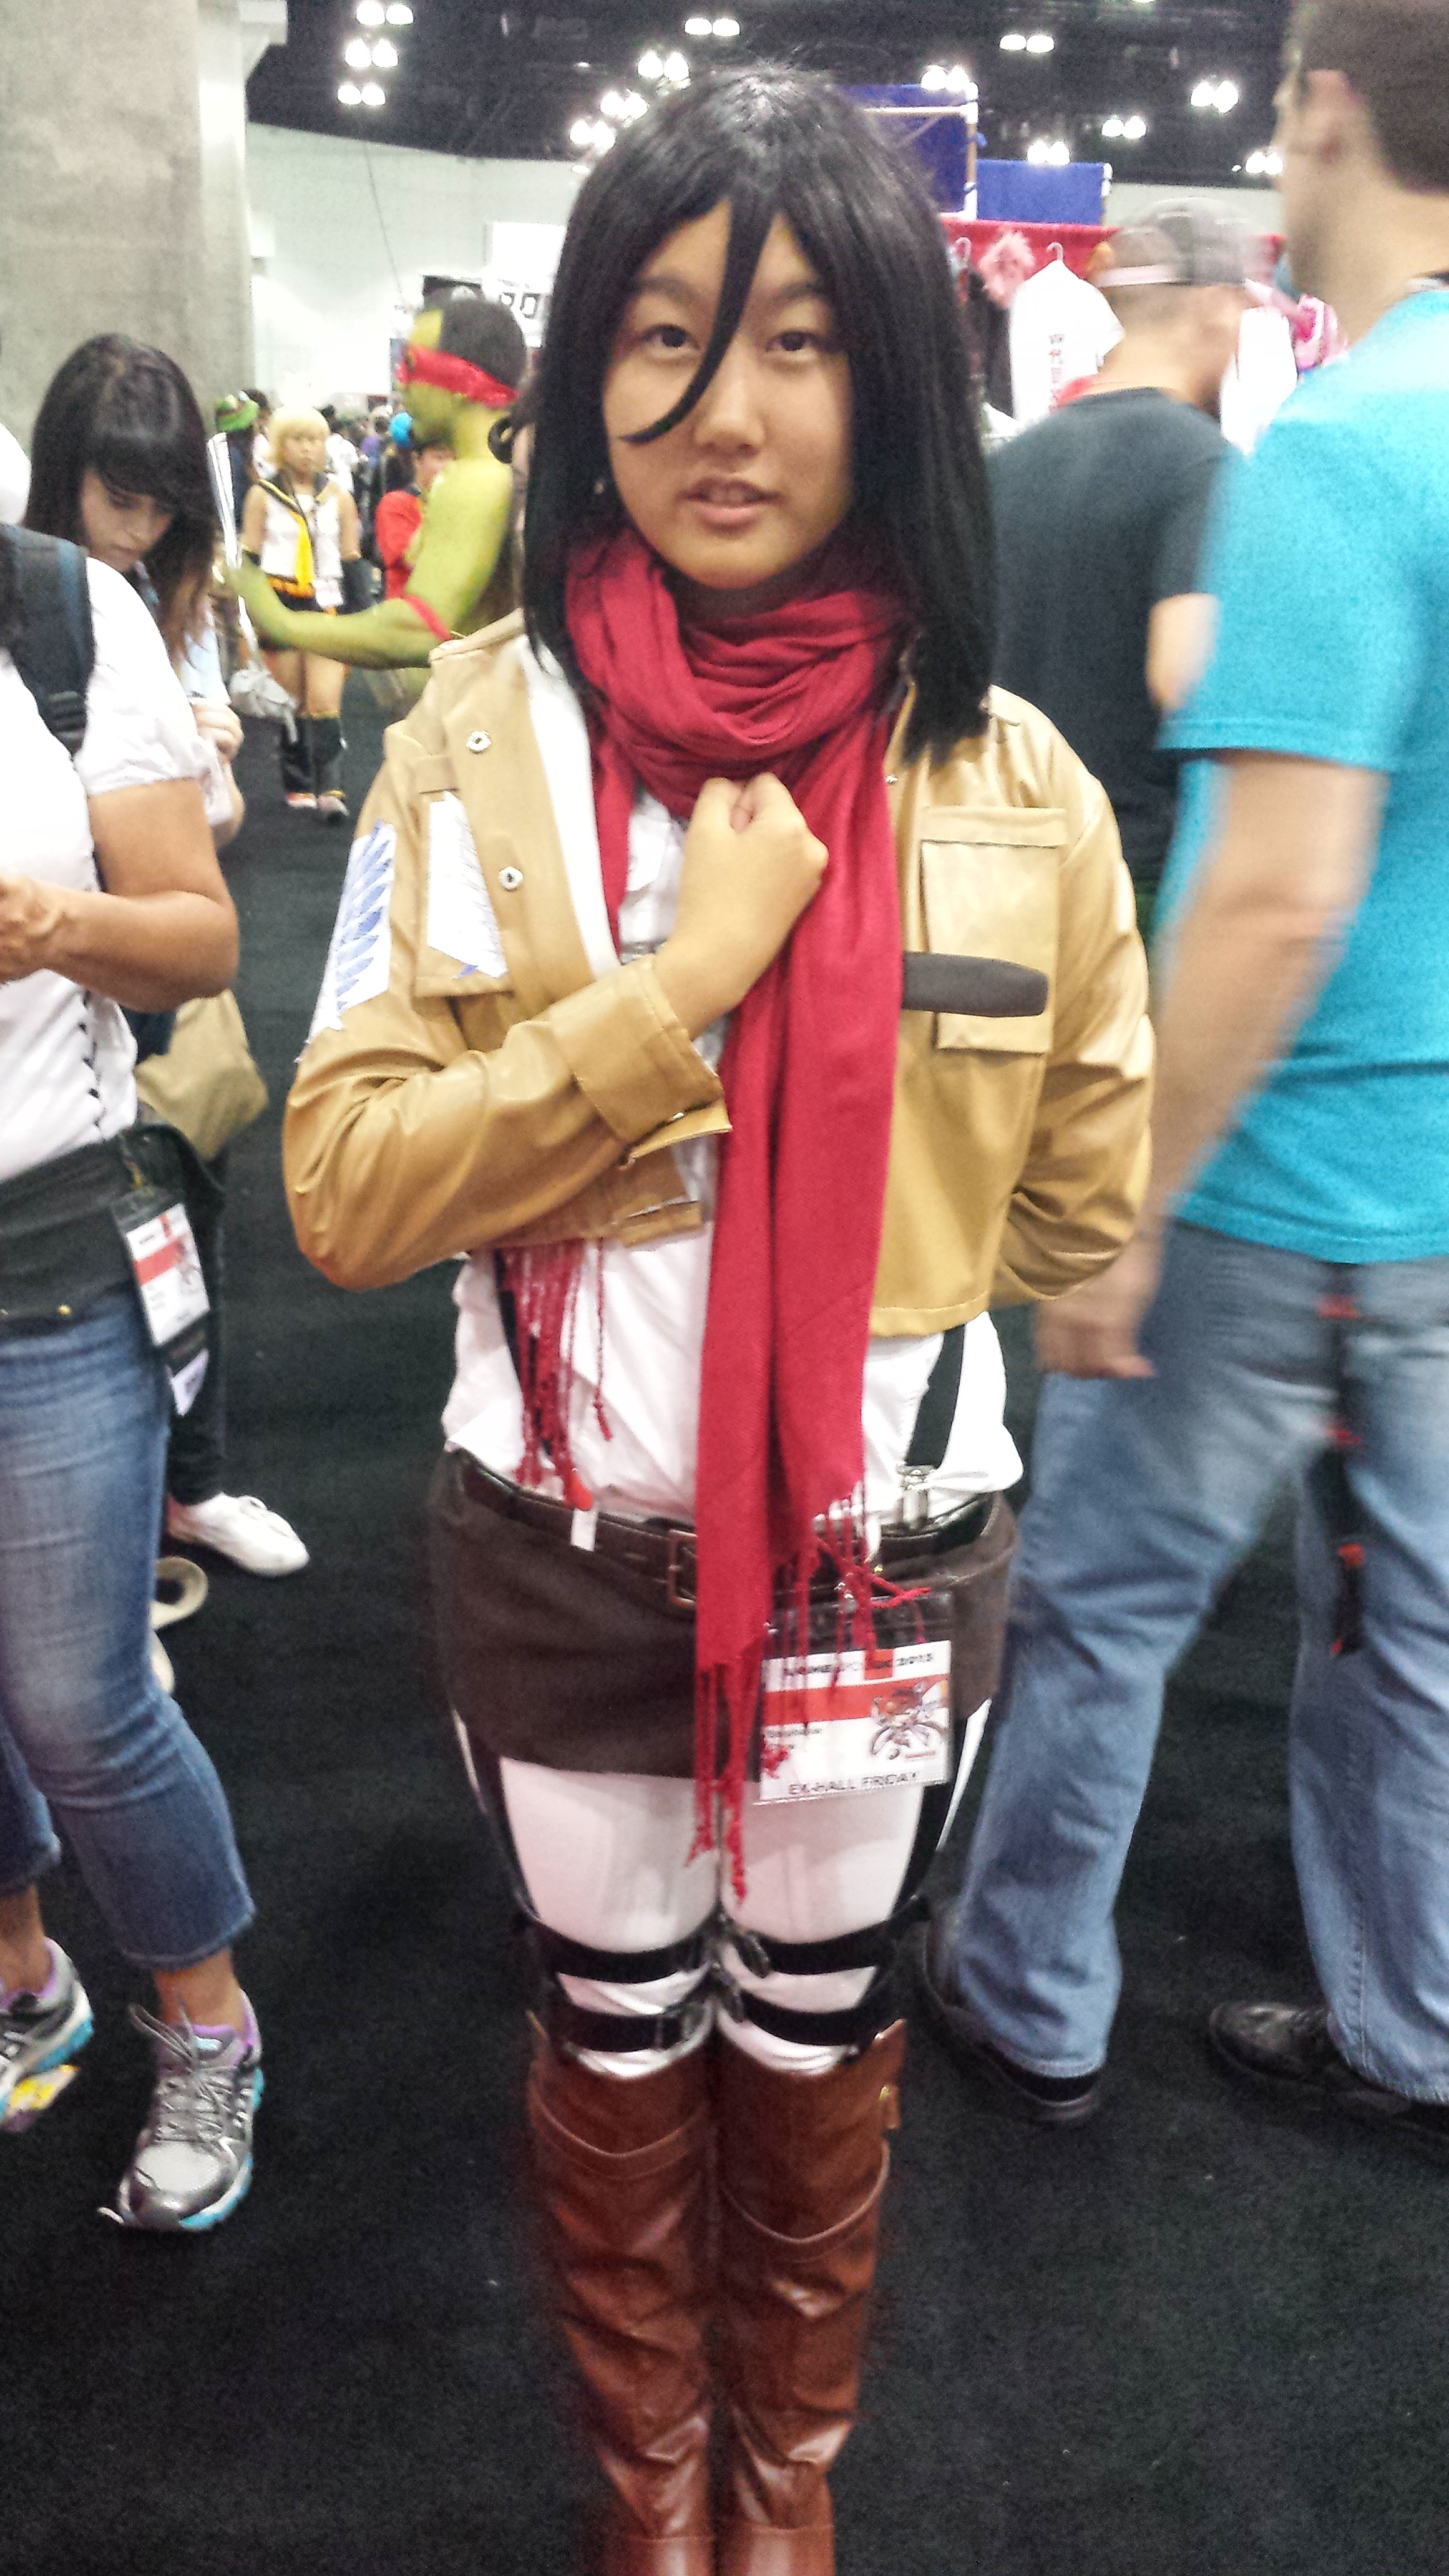 AnimeExpo 2013 - Mikasa ready for action